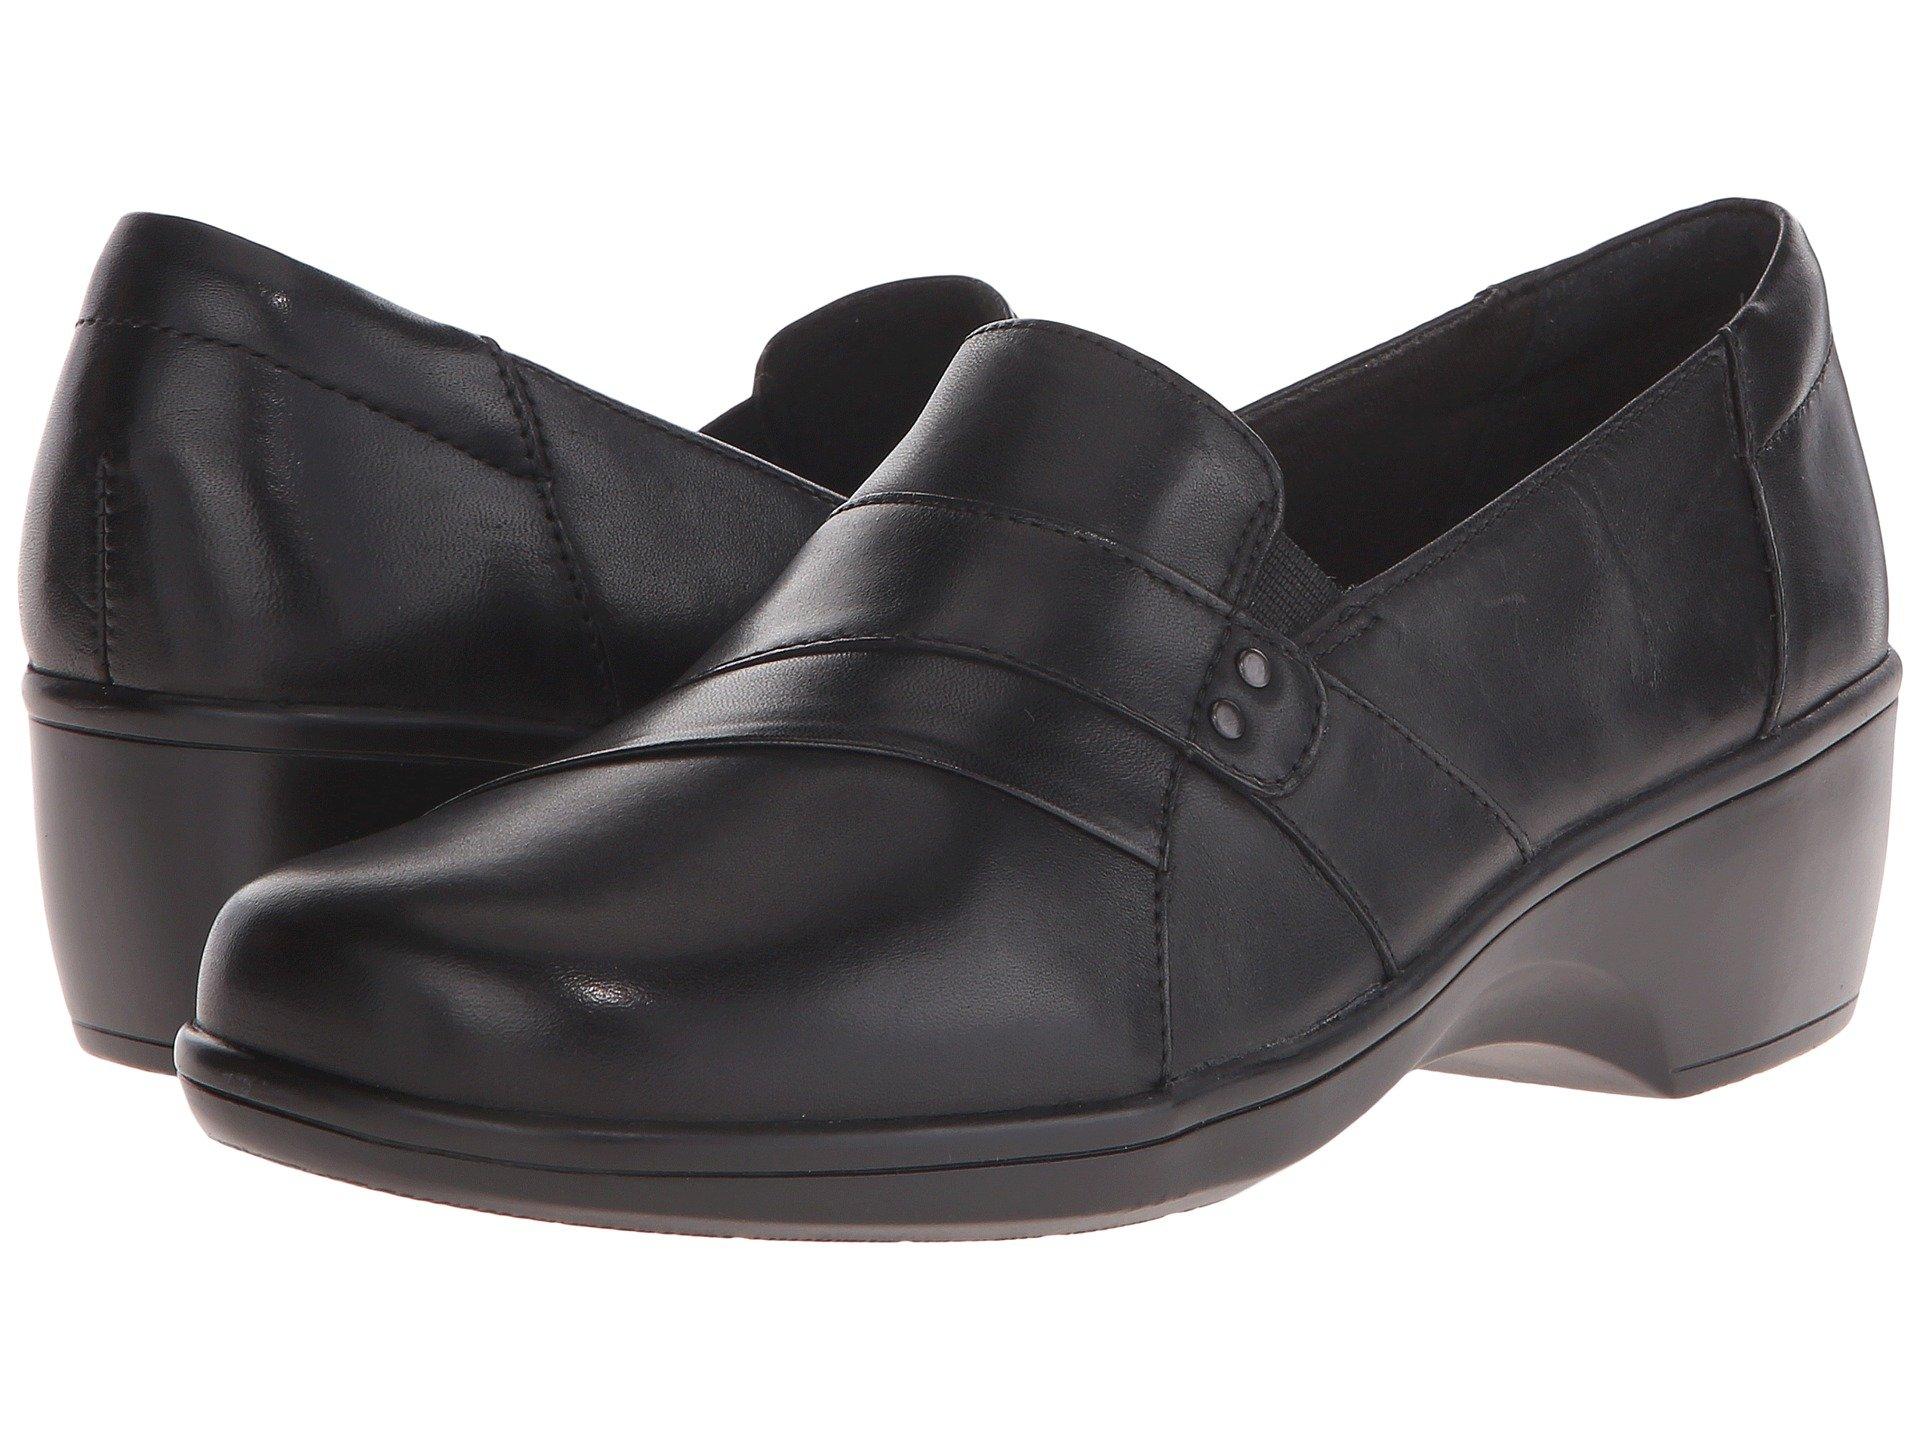 3b15bbc0149e Manmade Clarks Shoes + FREE SHIPPING